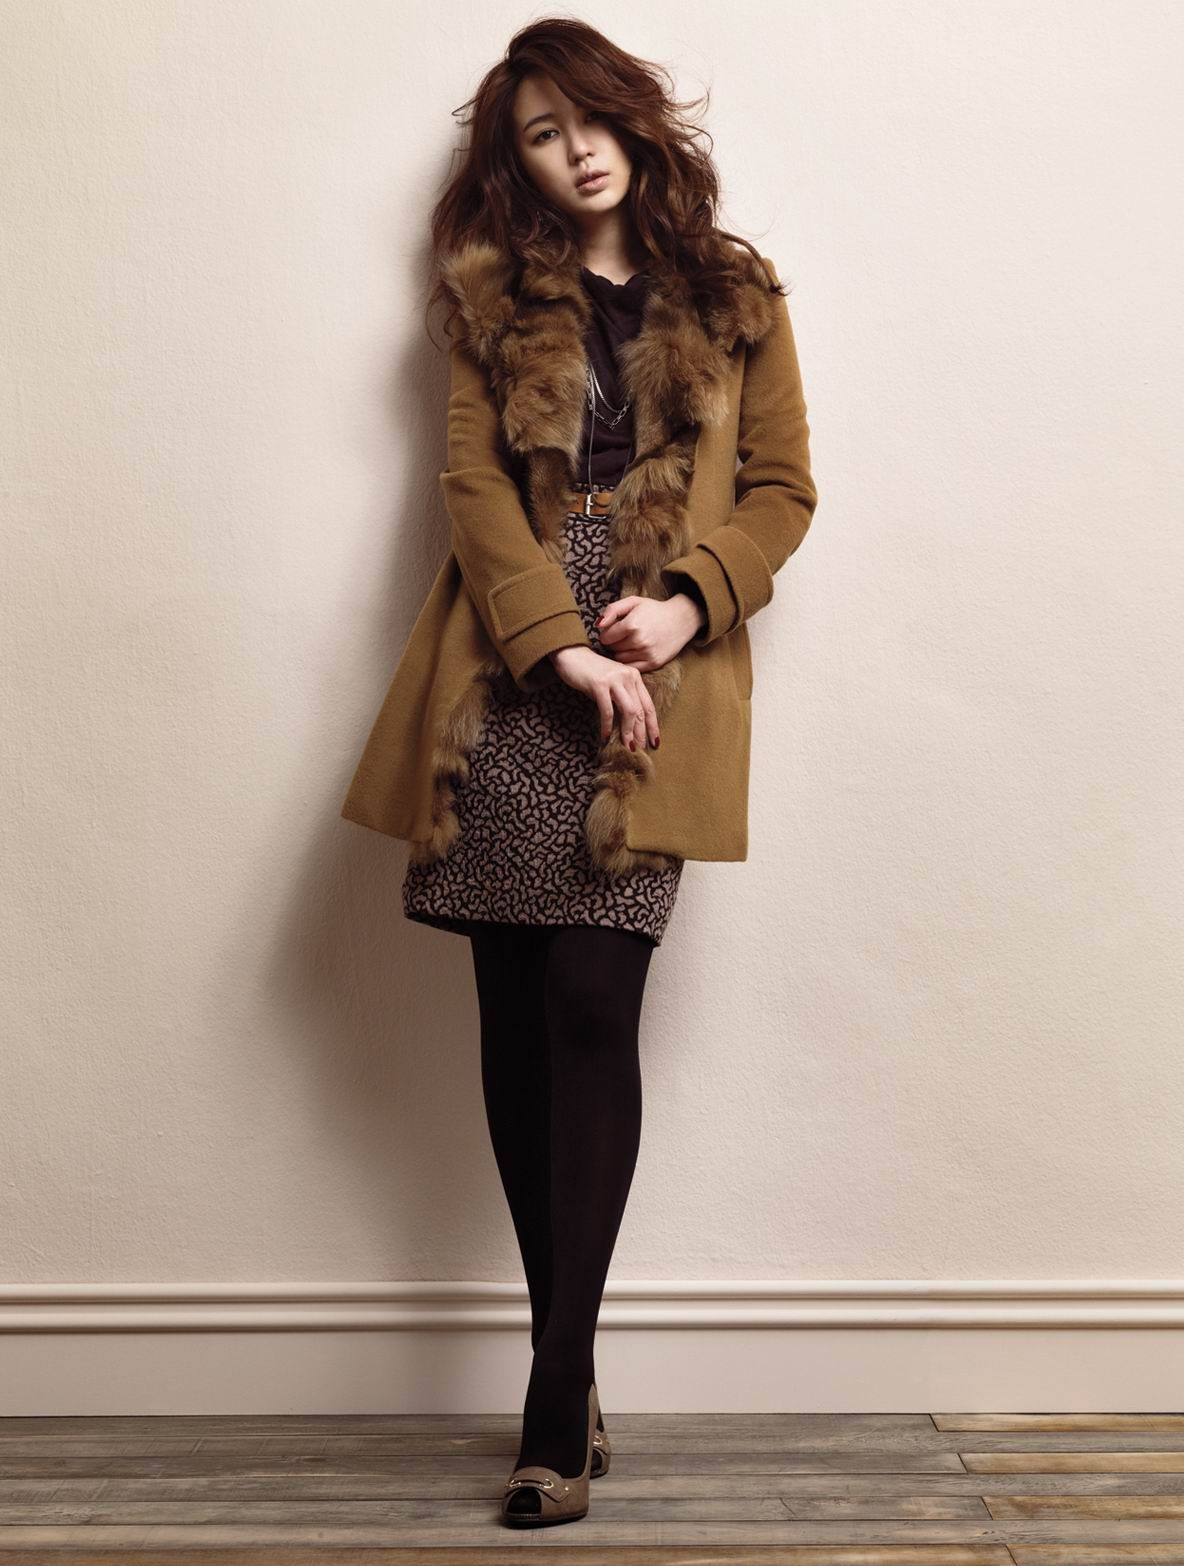 Yoon Eun Hye 04 Women 39 S Fashion Pinterest